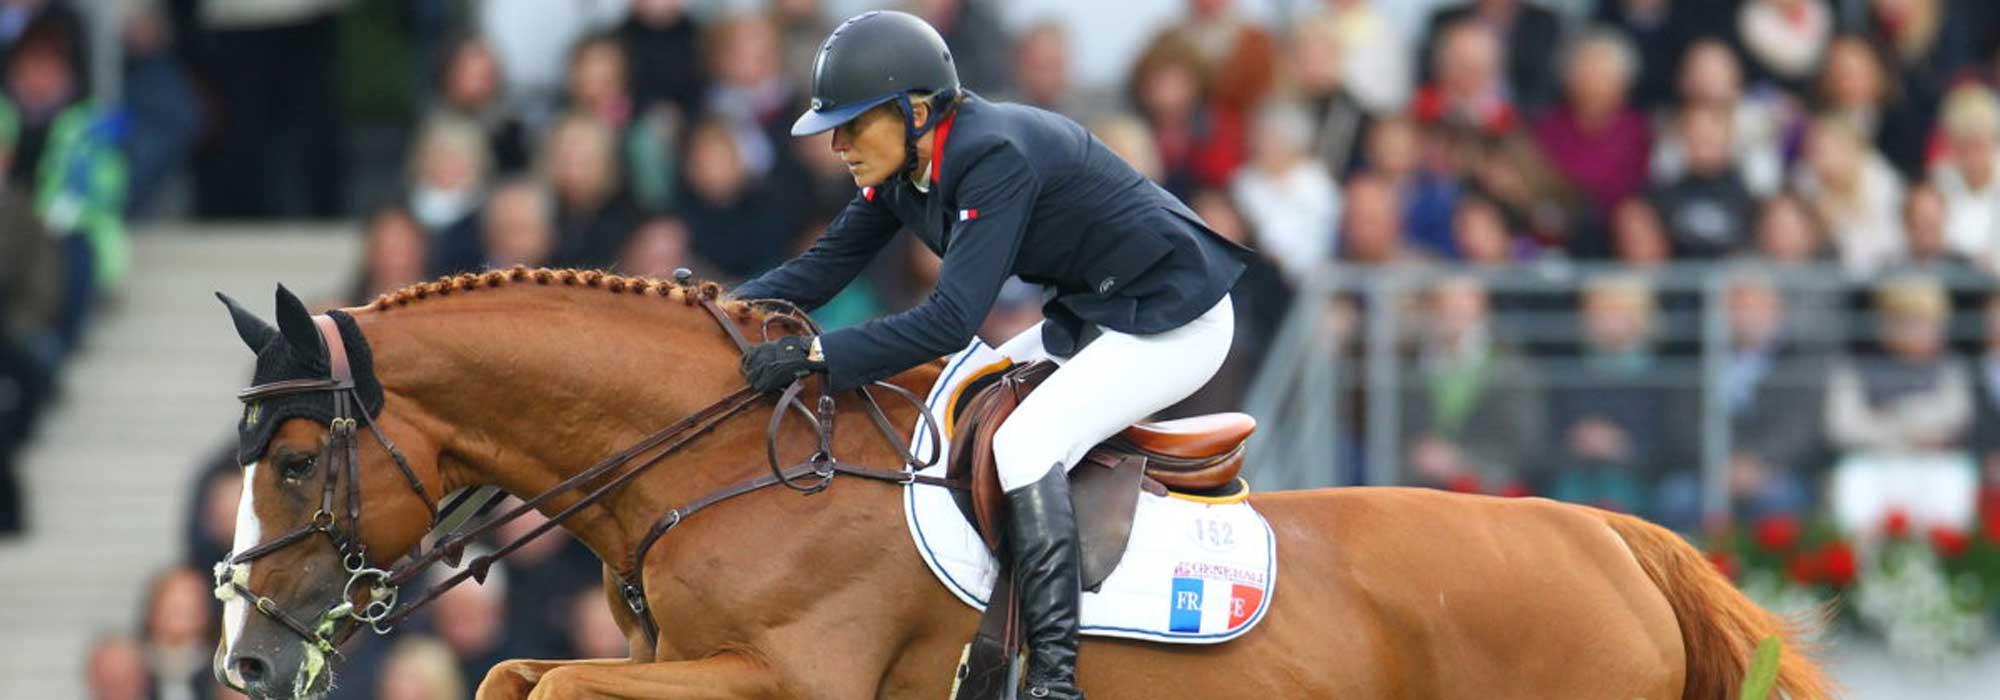 Photo Eugénie Angot cavalière Horsefeed